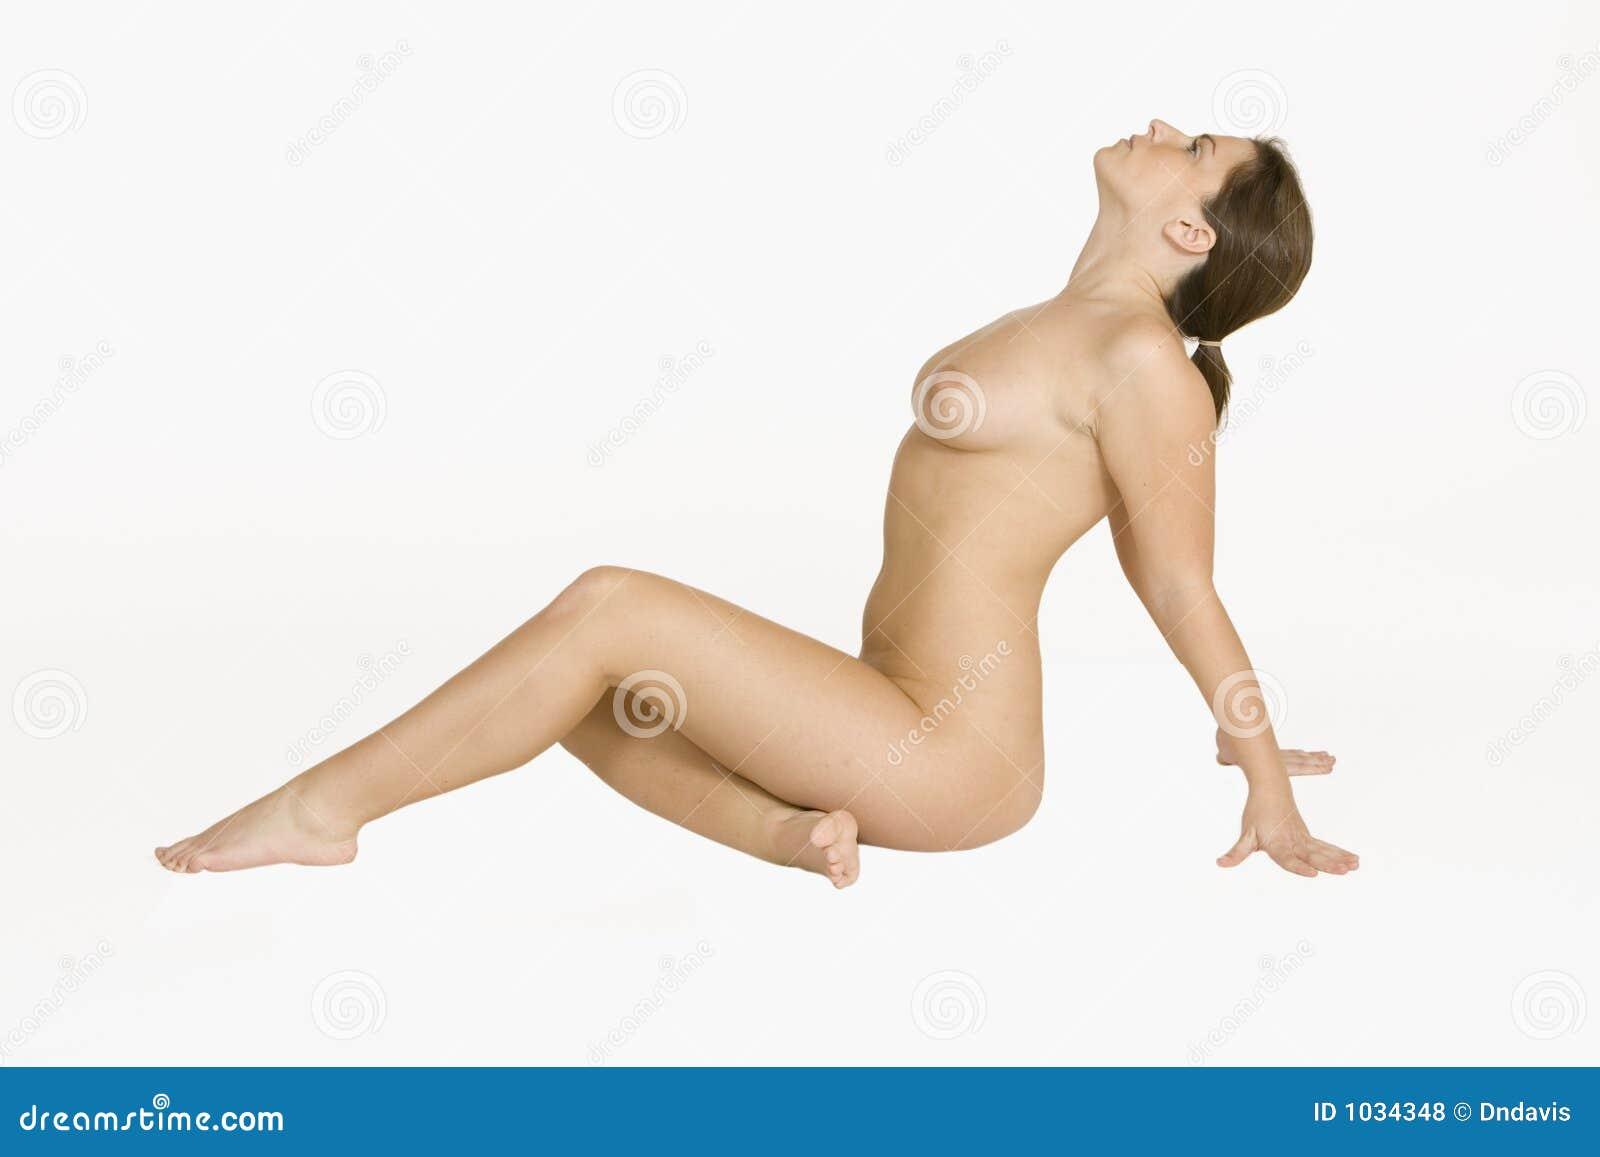 Full figure nude study regret